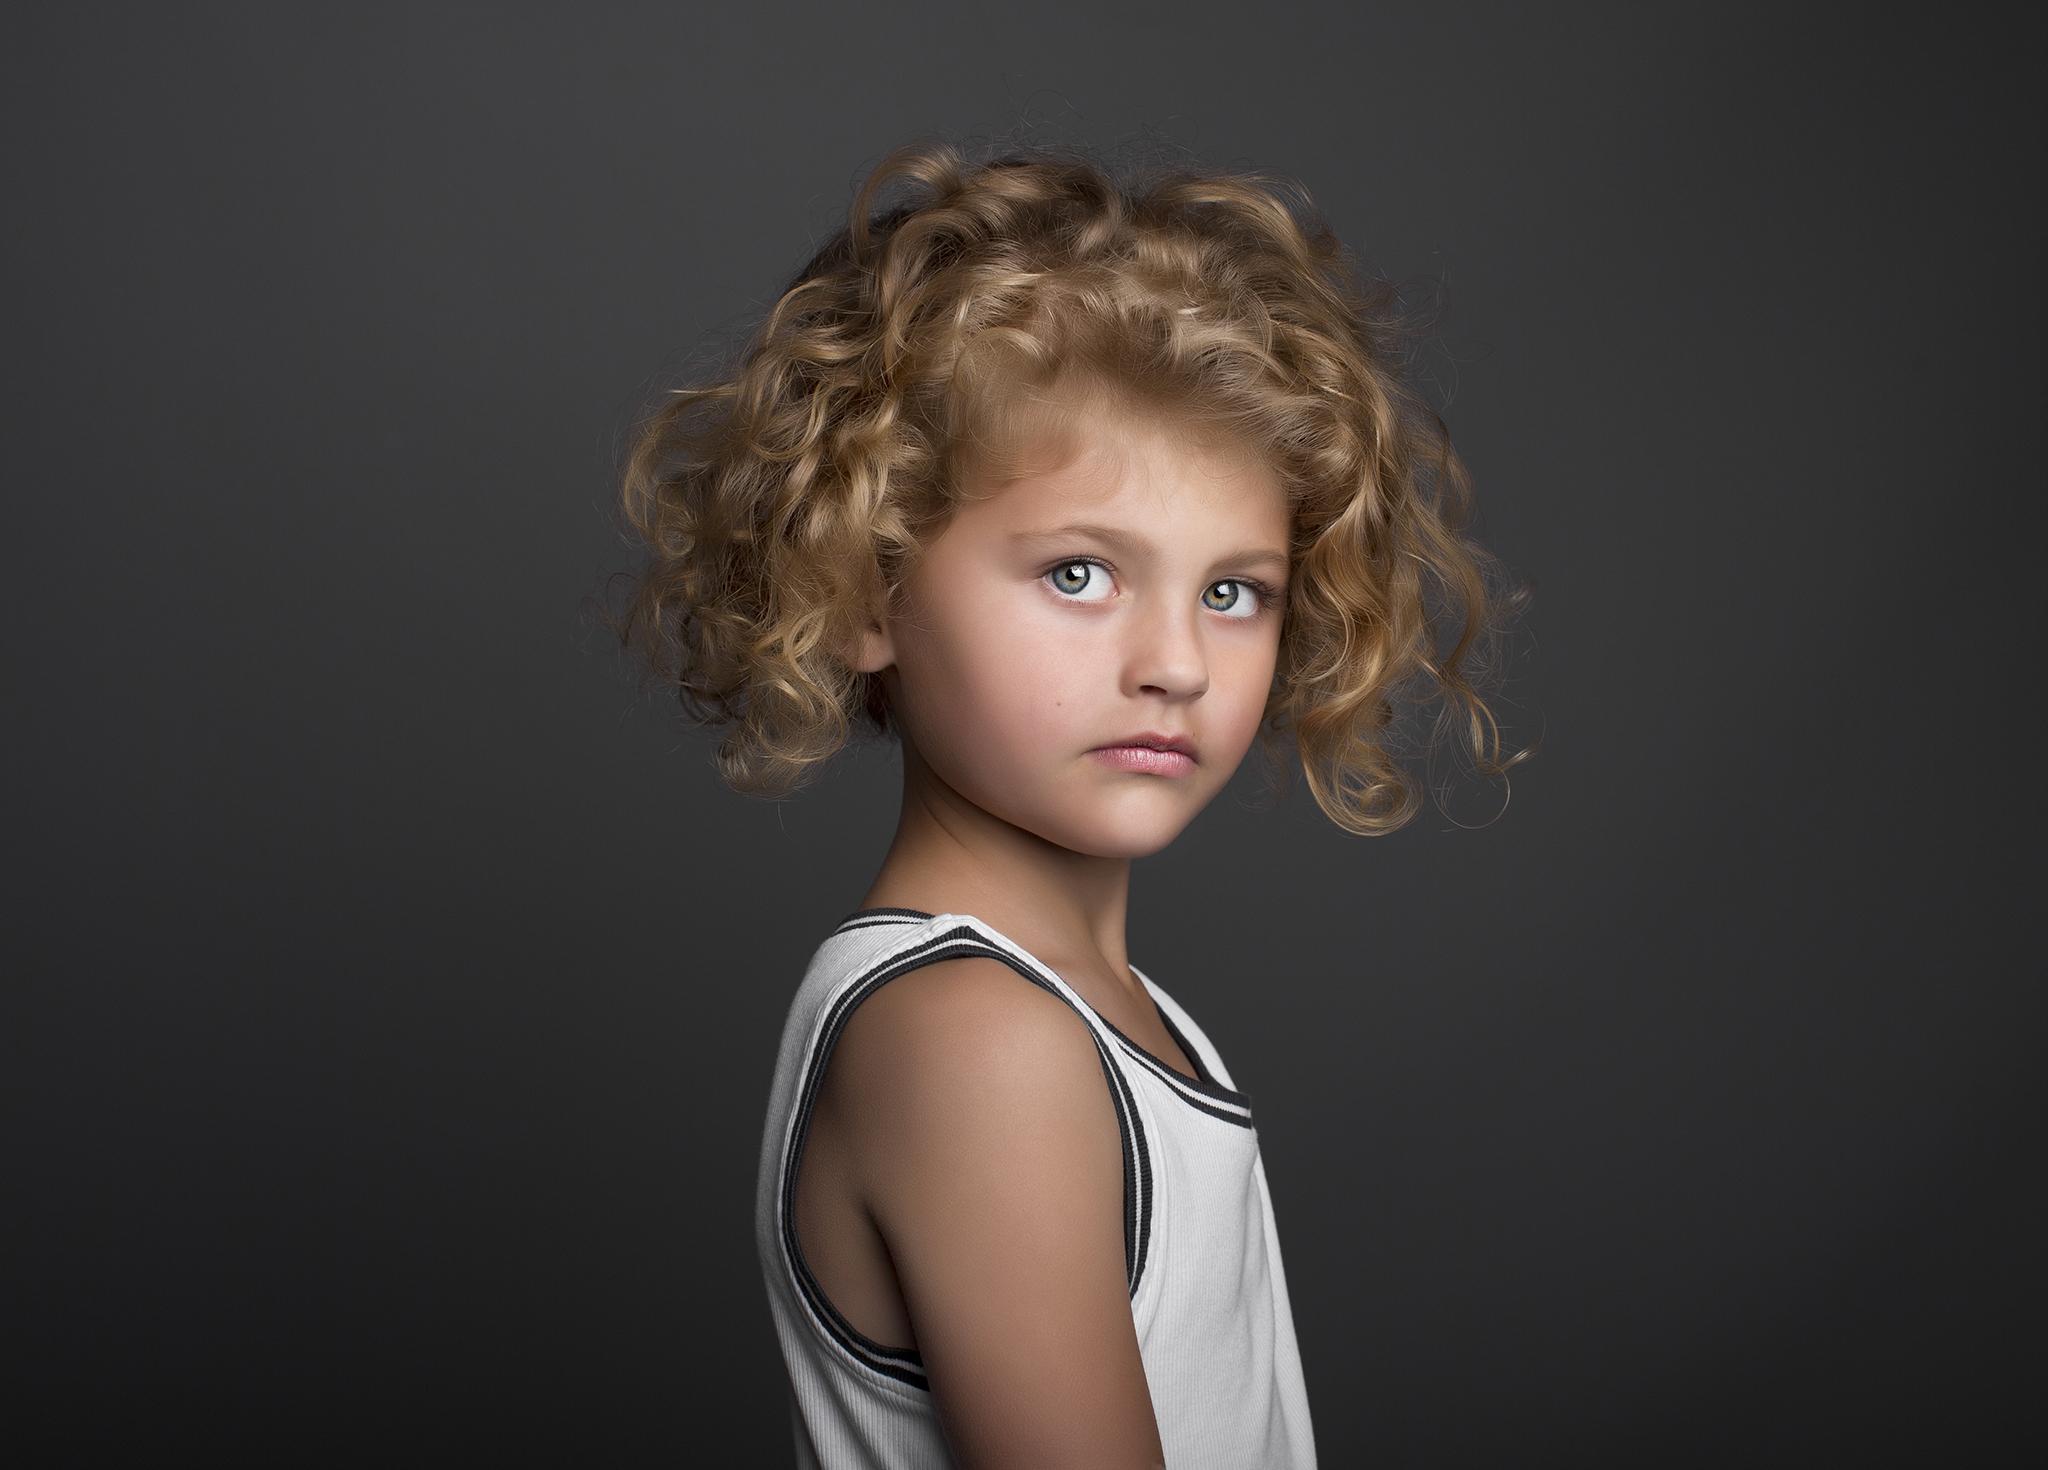 elizabethgphotography_fineart_kingslangley_hertfordshire_model_alexa_tiny_angels2.jpg